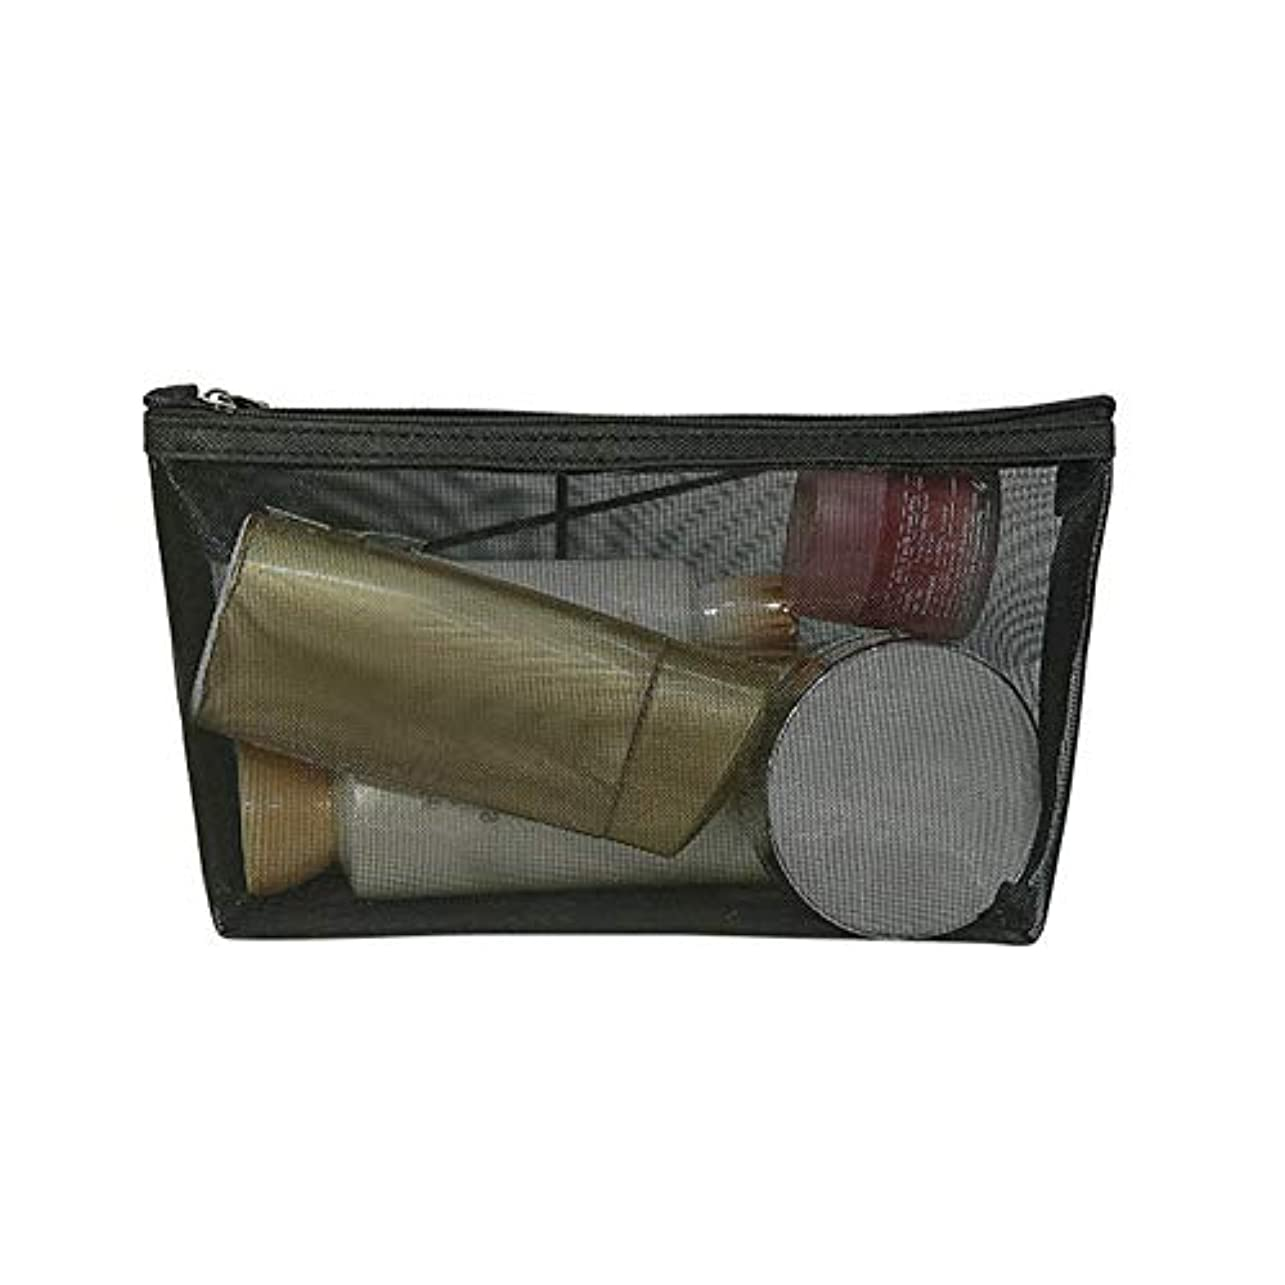 JanusSaja  旅行のための1個の化粧品化粧品袋透明ジッパー収納ポーチオーガナイザー